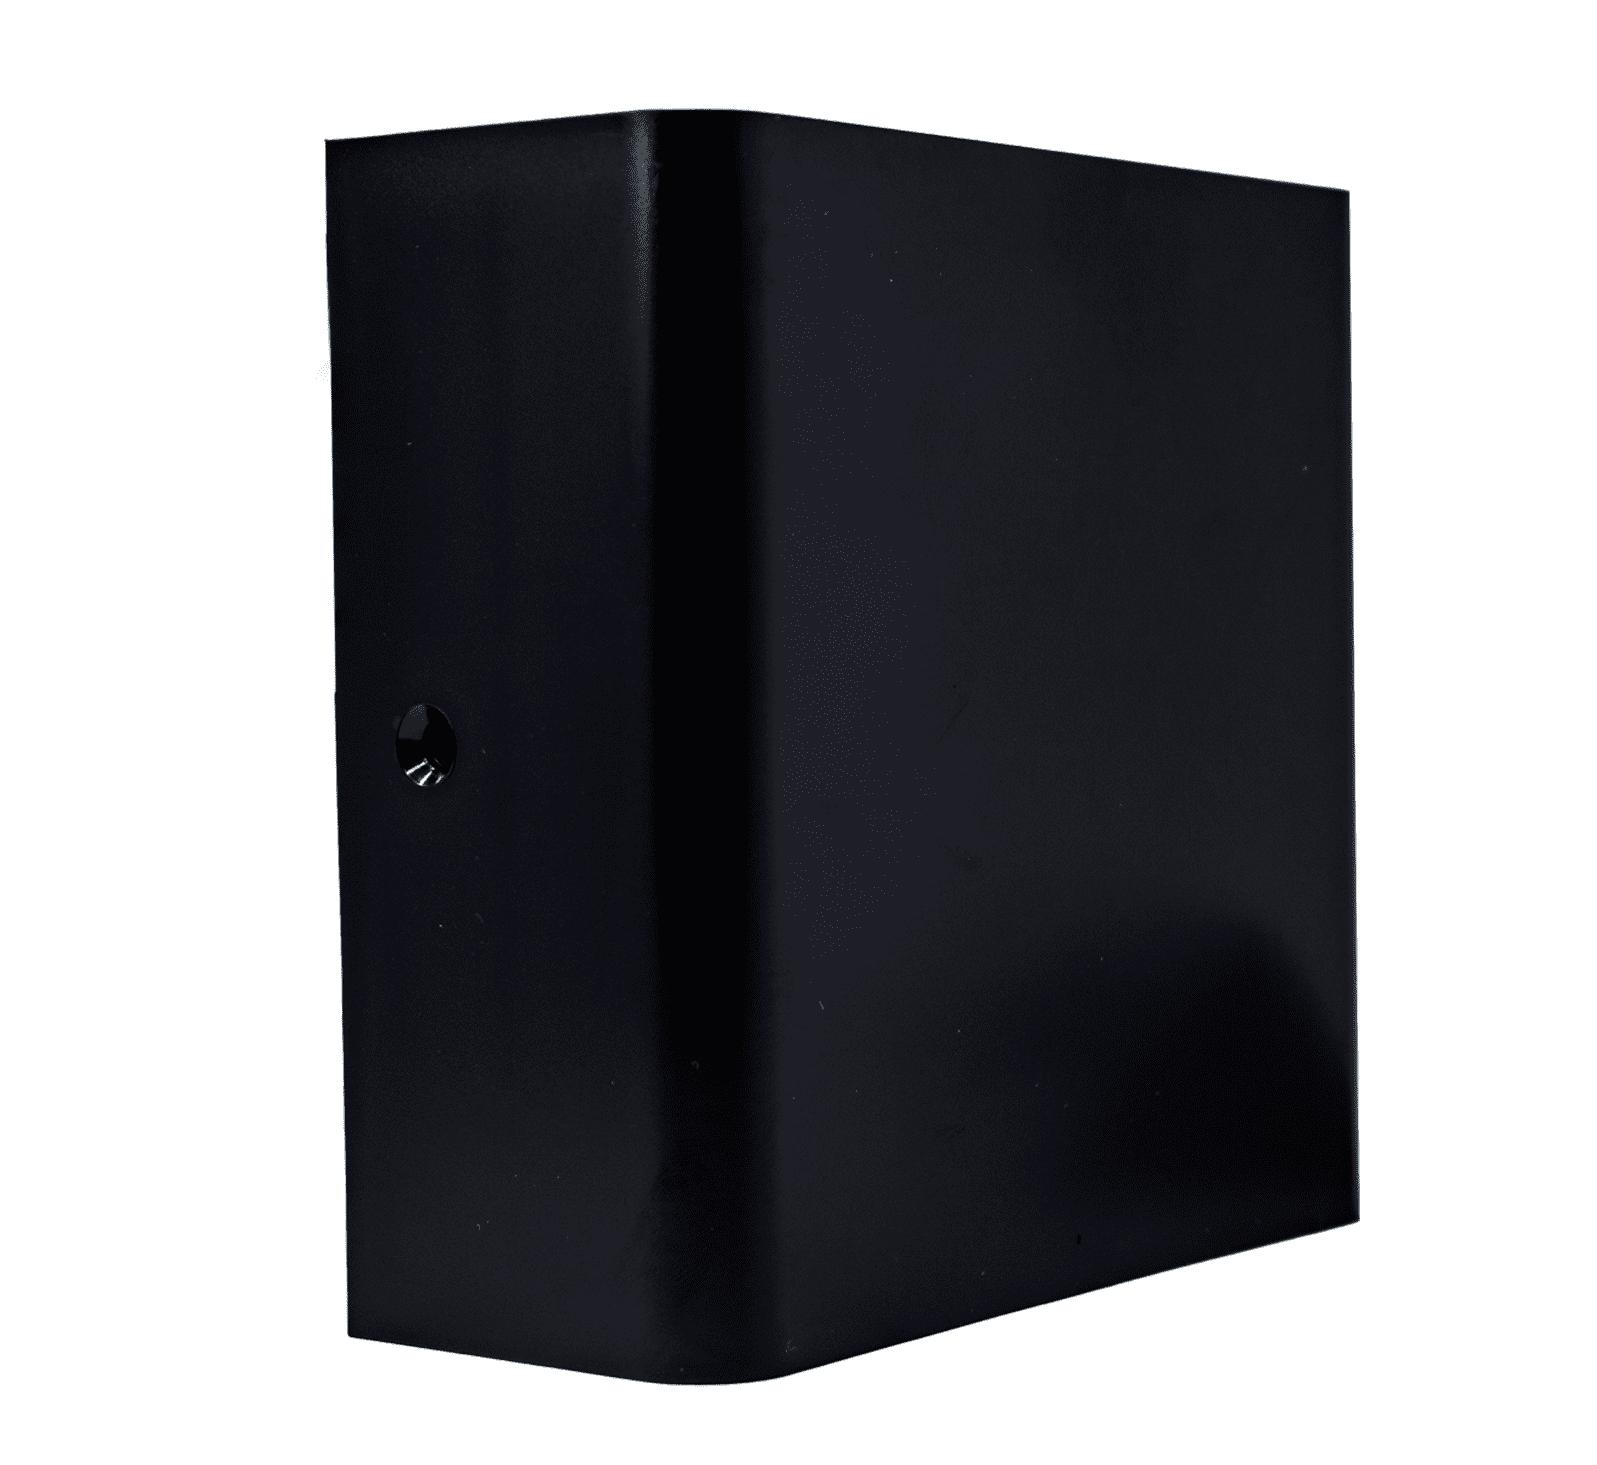 Luminária Arandela Led Kian 12820 IP65 3W 3000K Preta